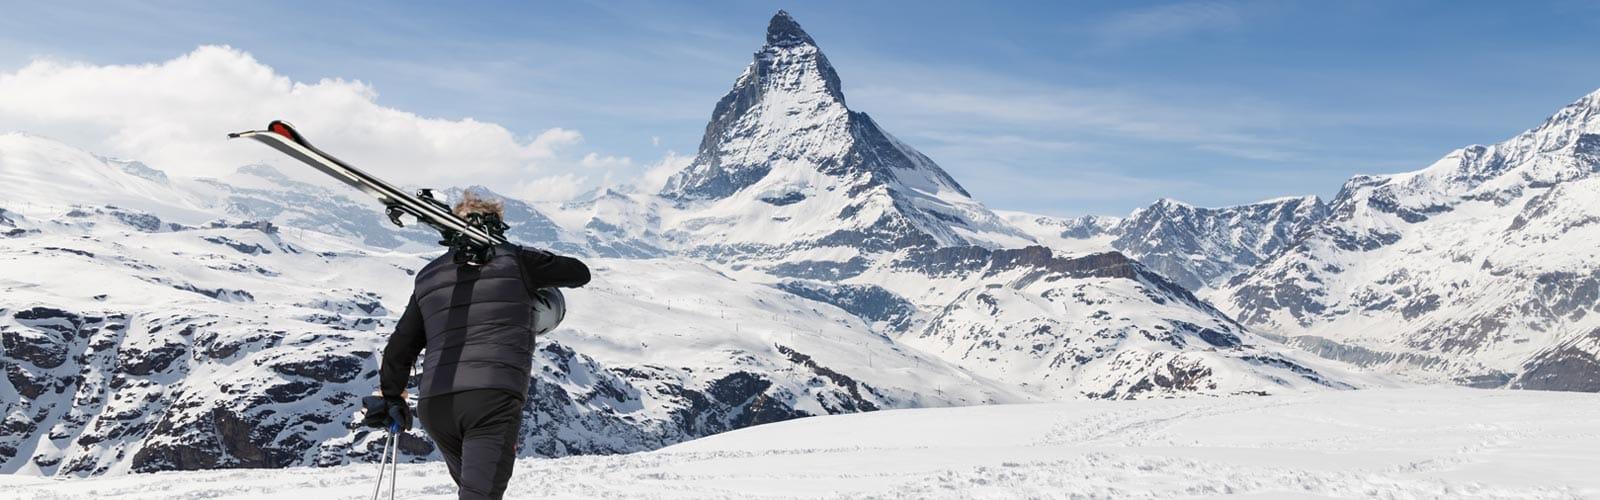 How to Choose Ski Length